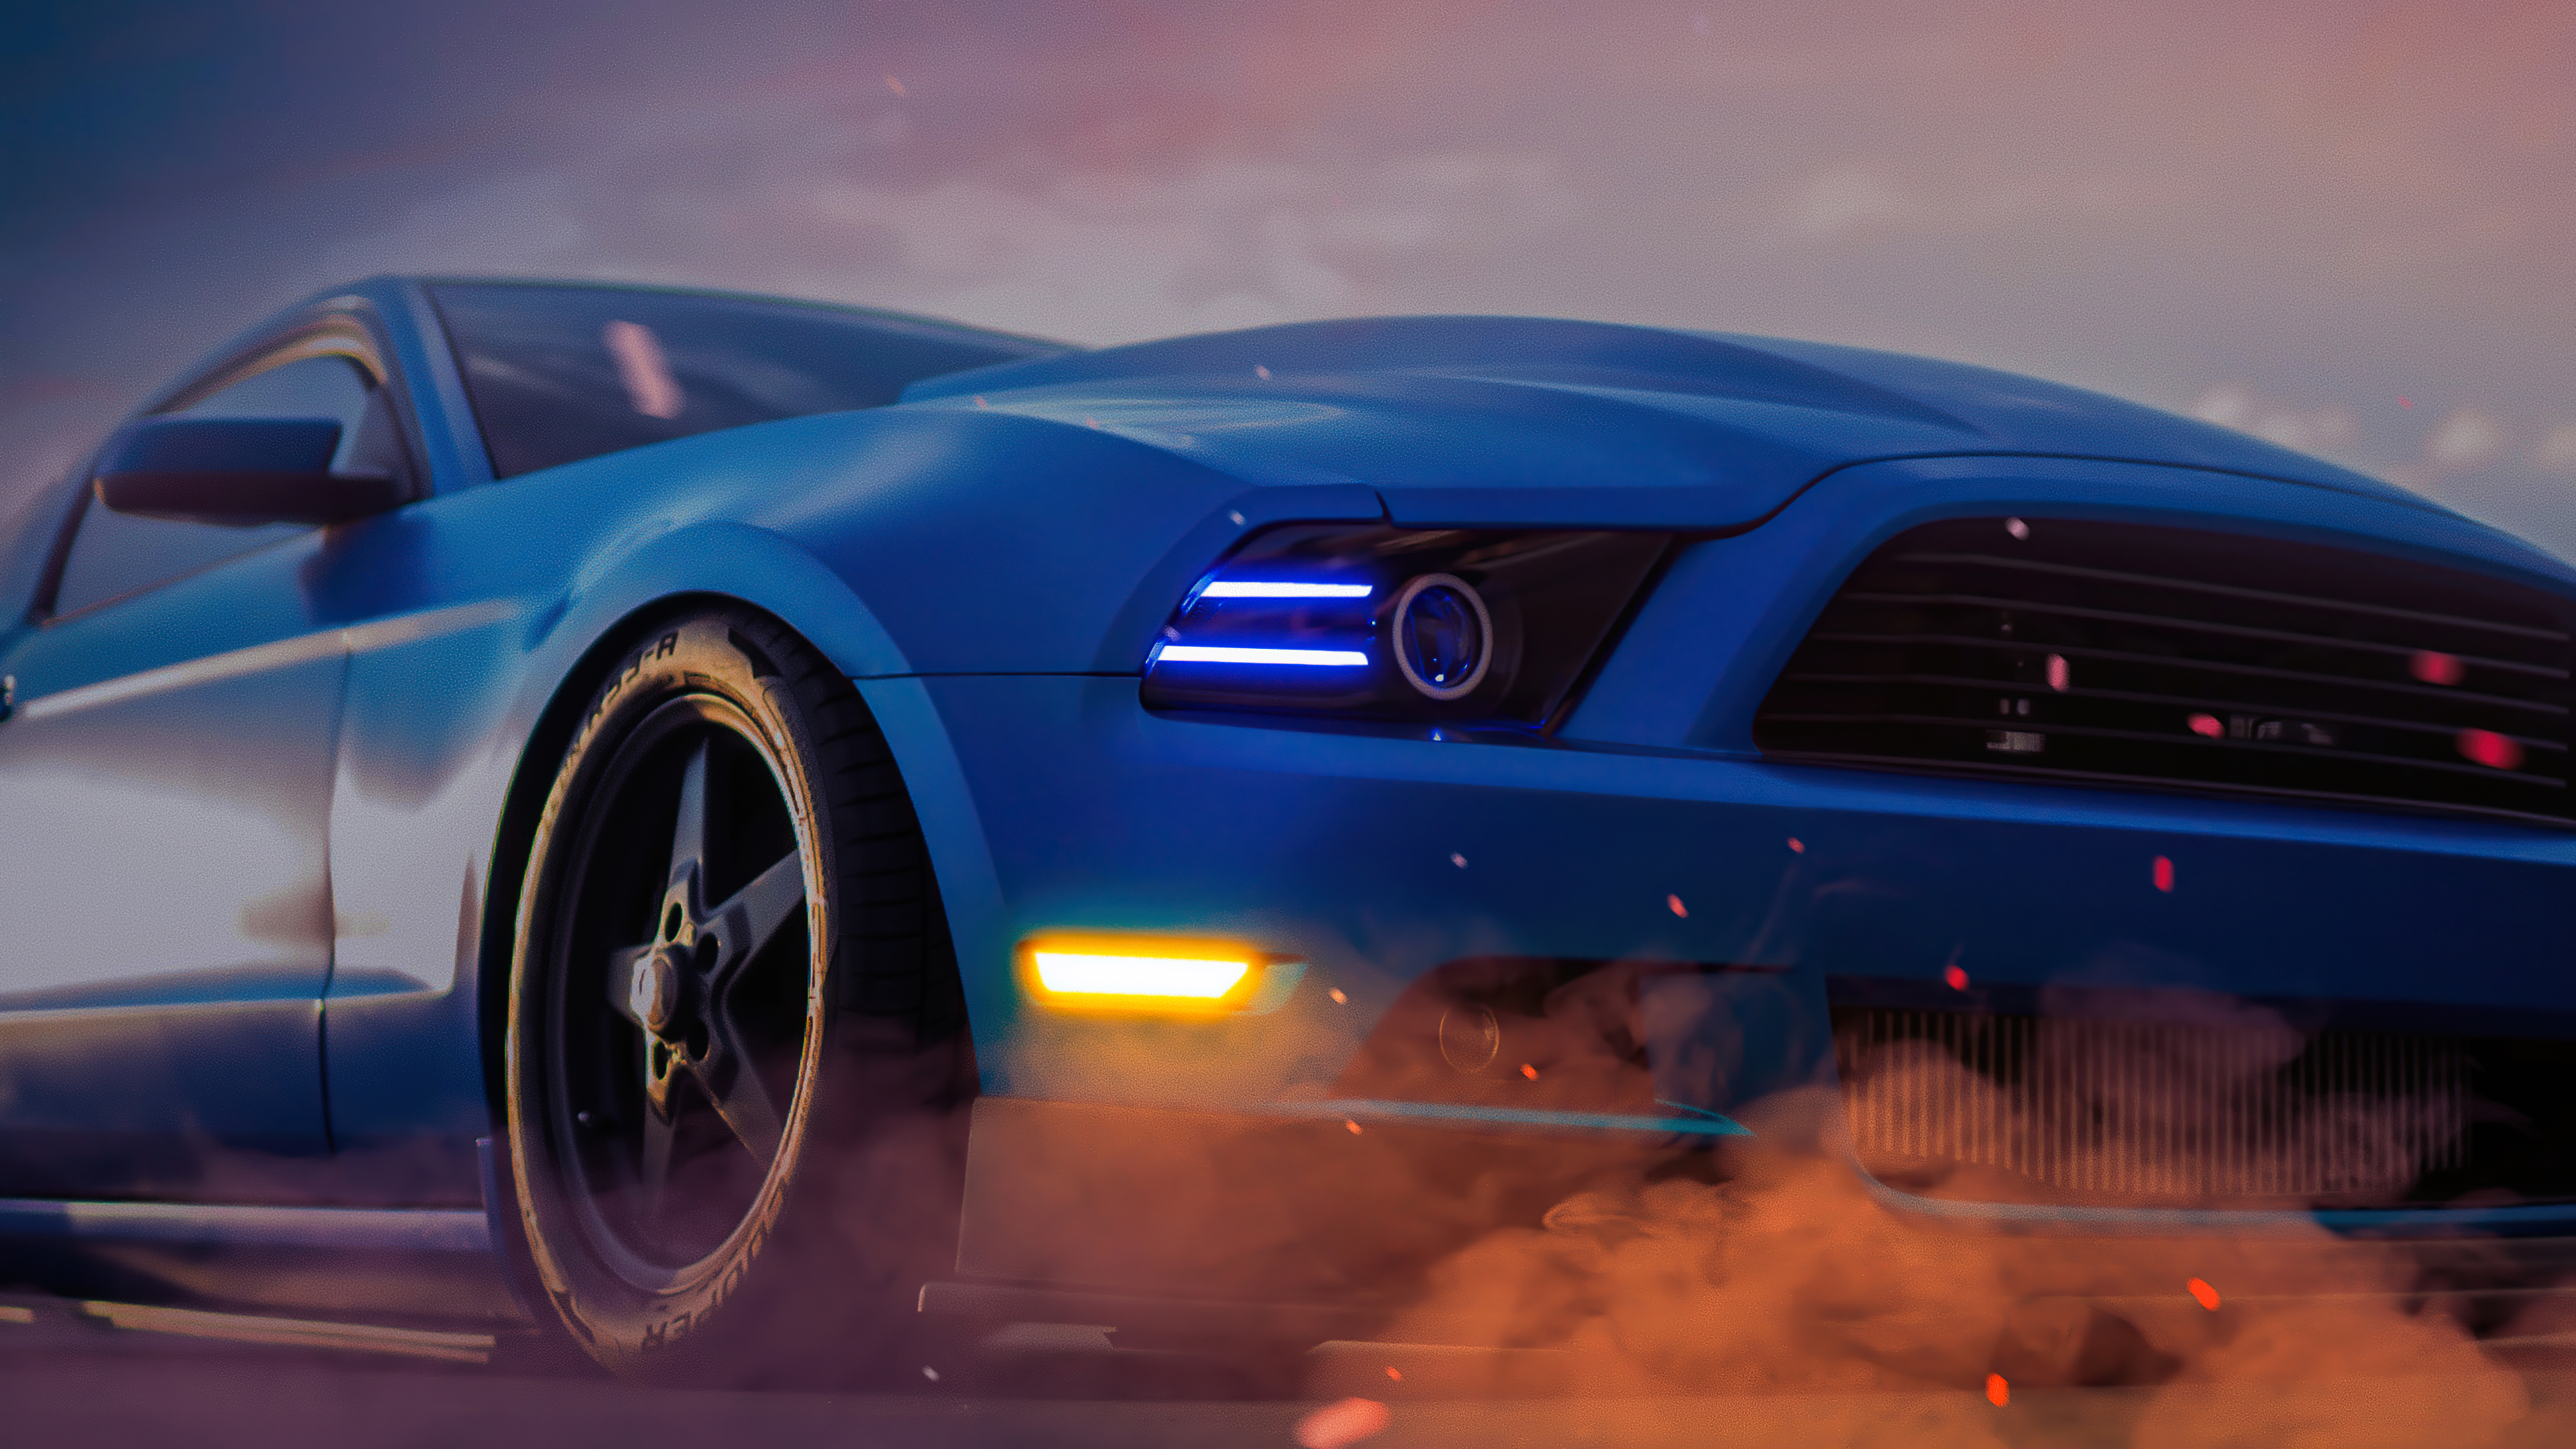 blue camaro 4k 1620167814 - Blue Camaro 4k - Blue Camaro 4k wallpapers